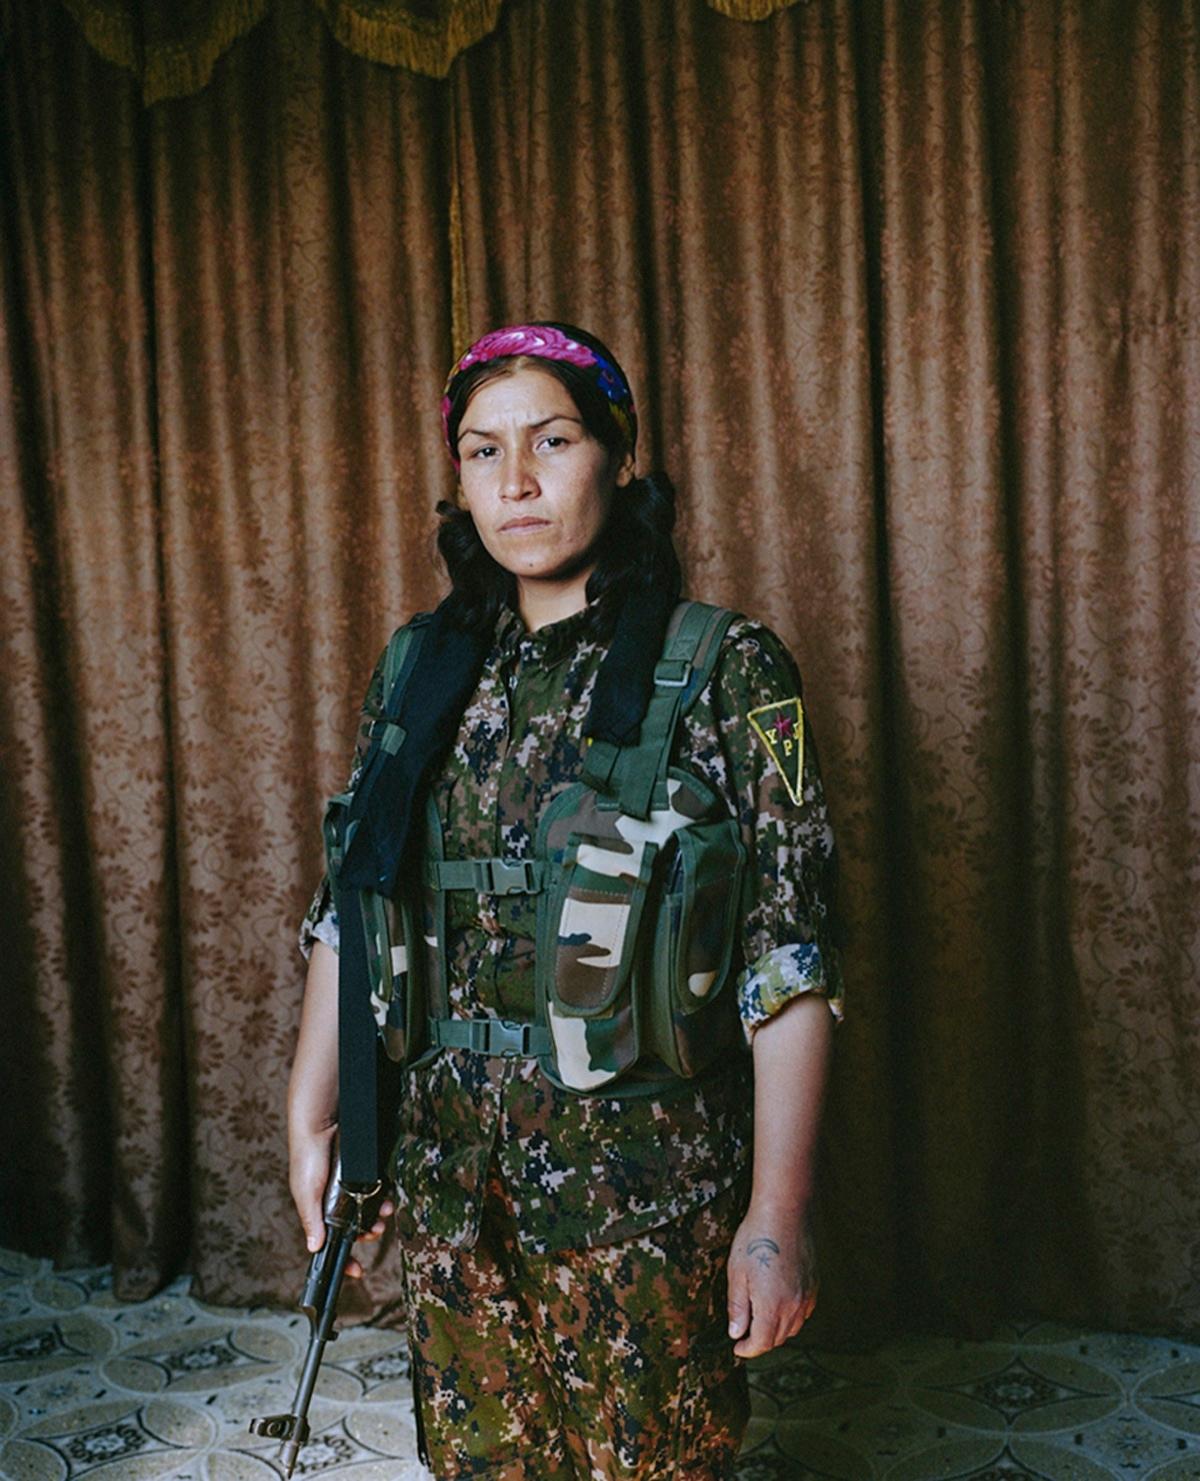 free women Sonja Hamad - bintphotobooks | ello